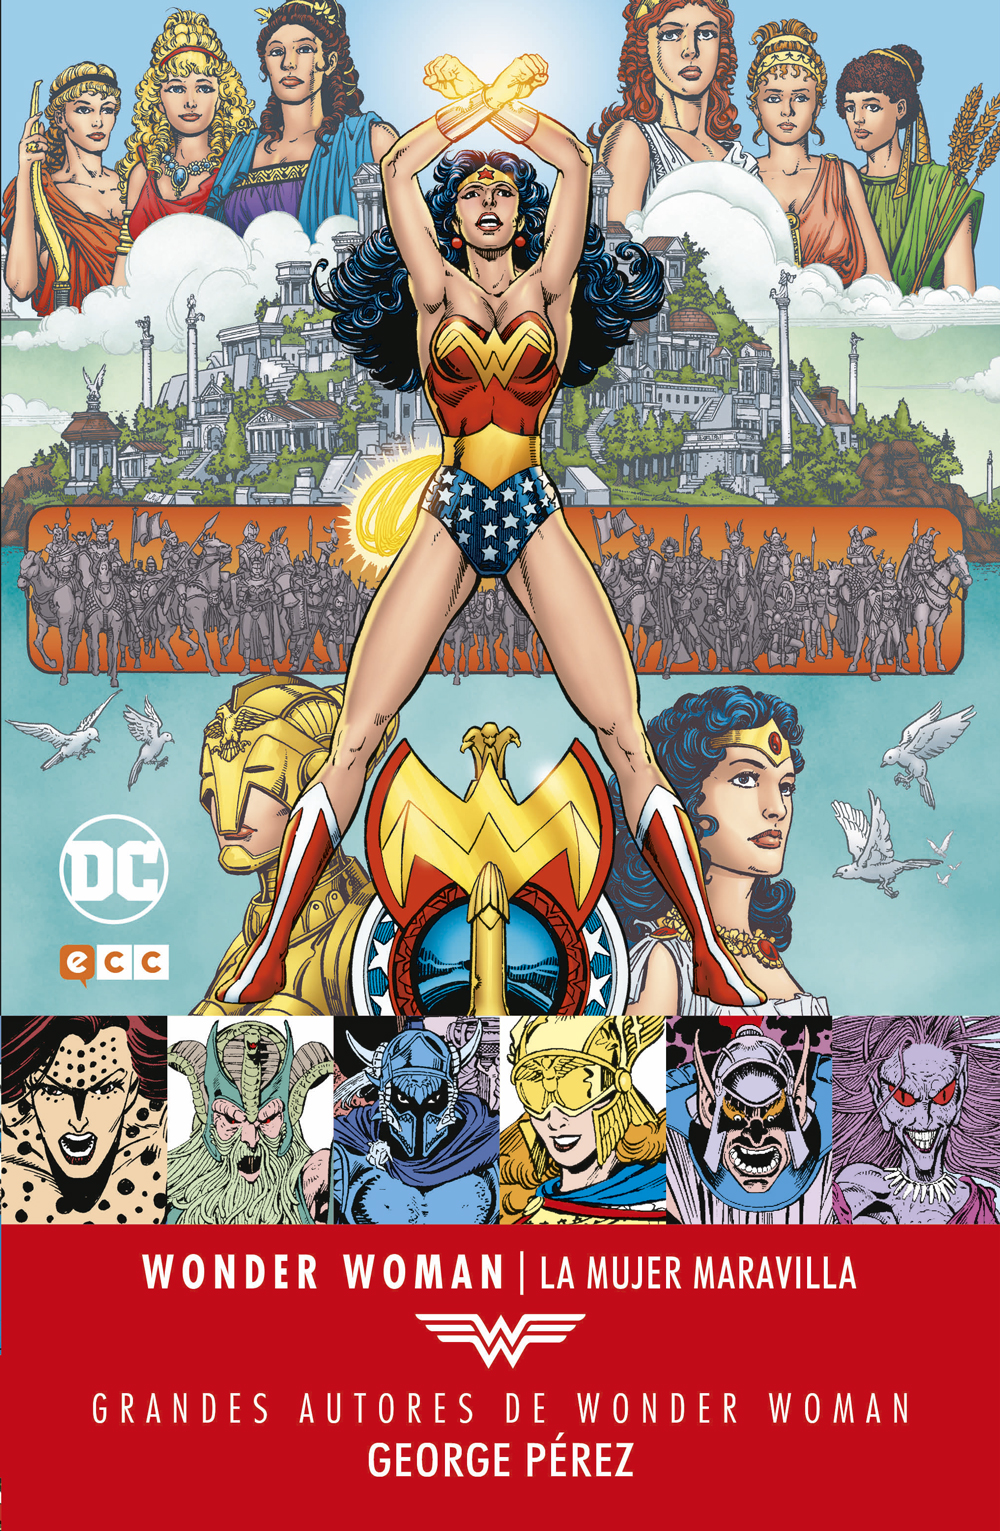 Grandes autores de Wonder Woman: George Pérez – La Mujer Maravilla